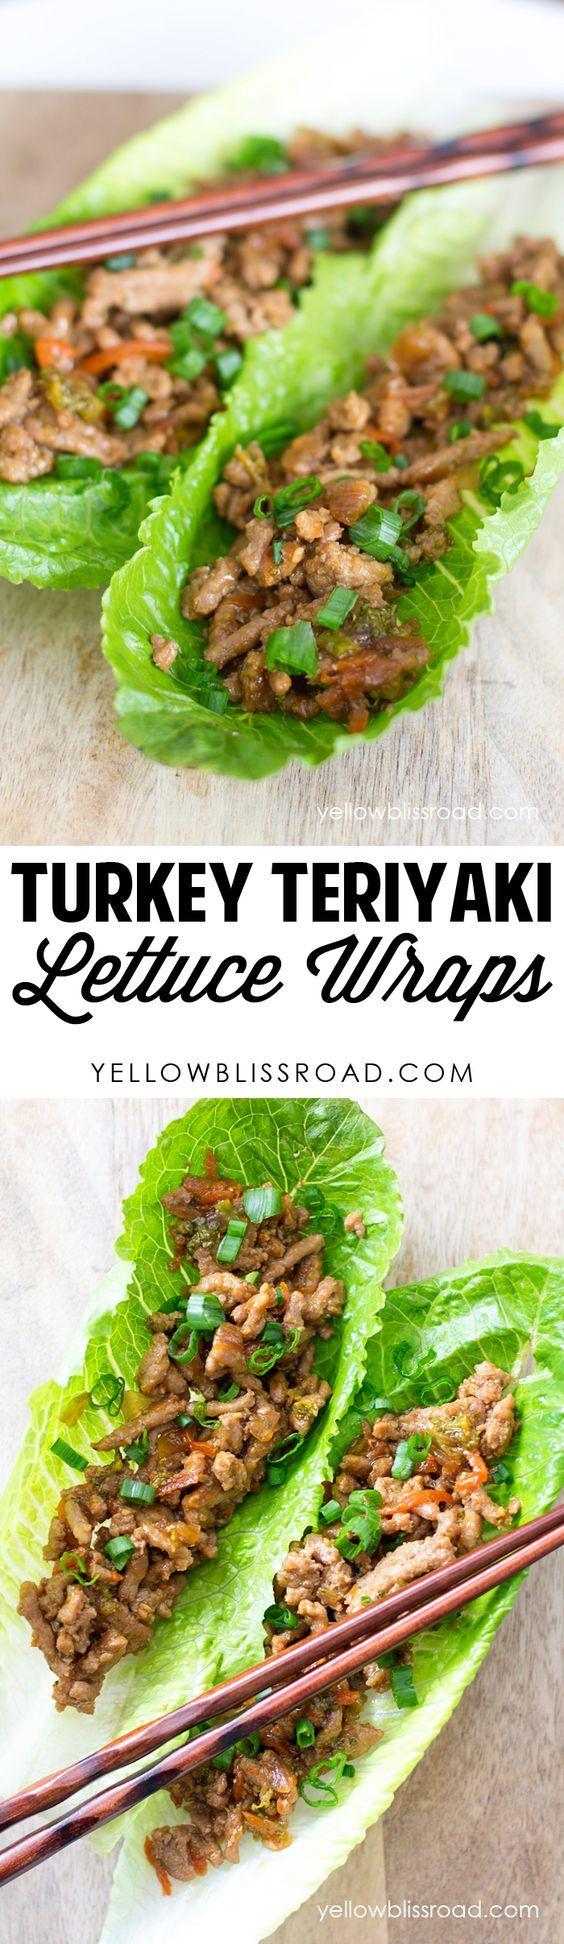 Turkey Teriyaki Lettuce Wrap recipe. Delicious and healthy dinner idea.